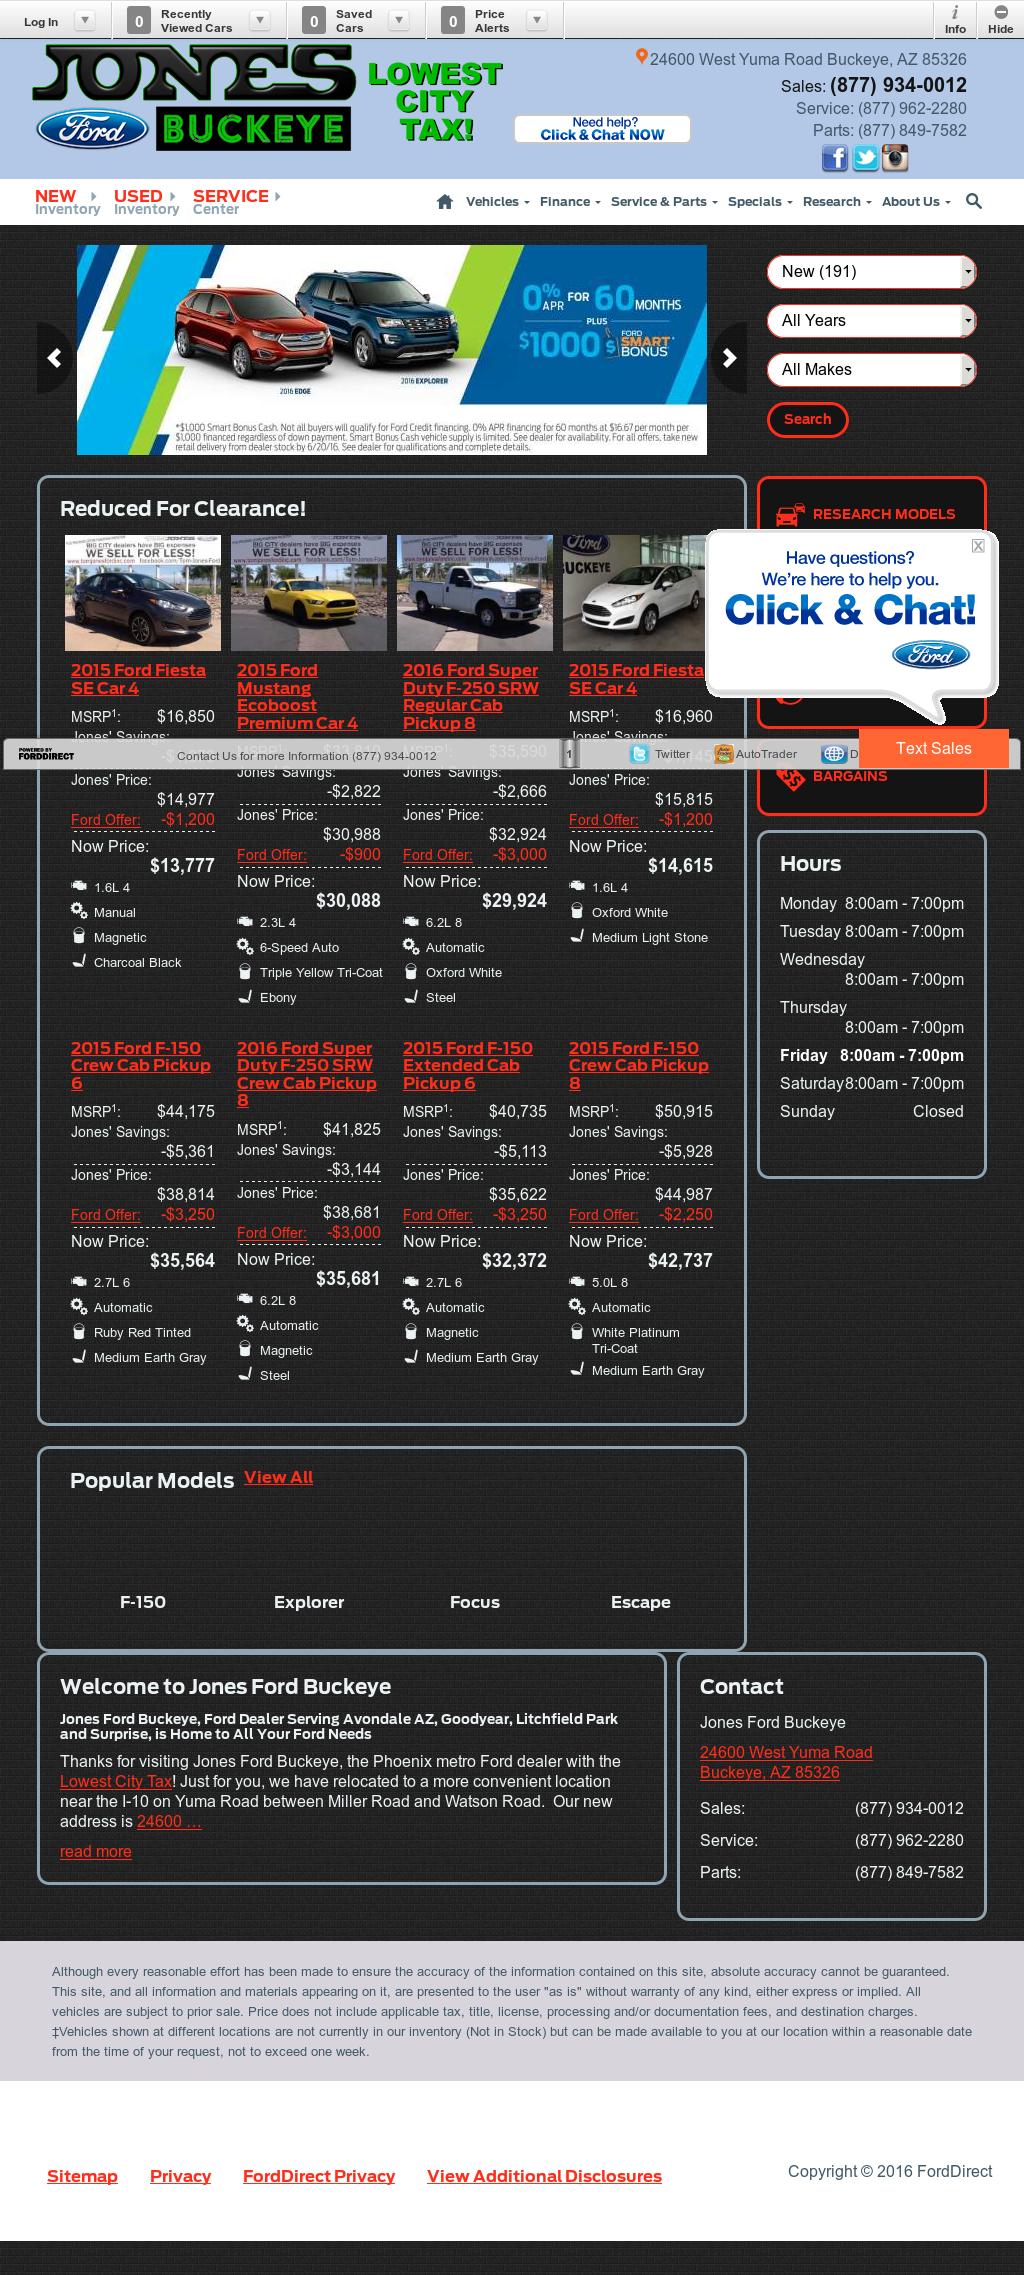 jones ford wickenburg 2020 auto car release date bathroom remodel cost